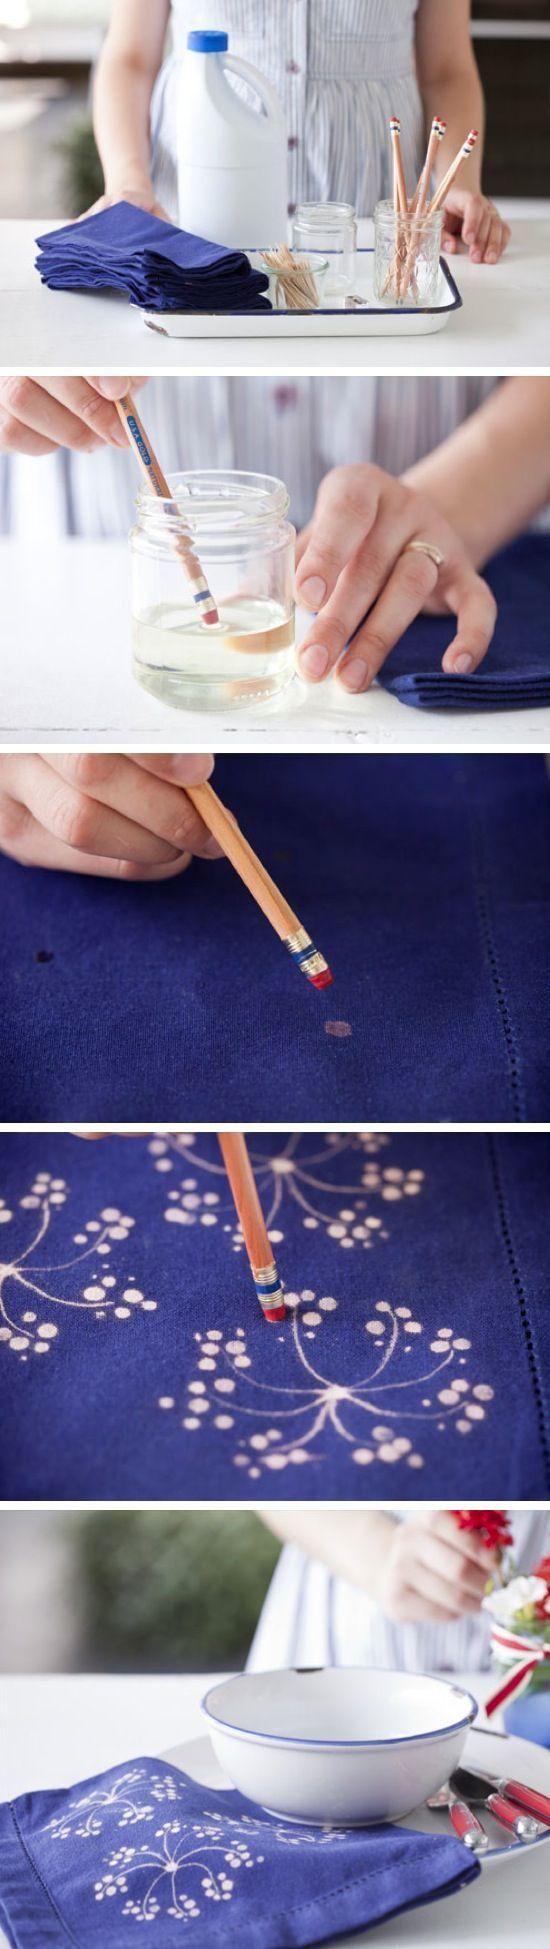 Fabric Bleach Art. - Joybx